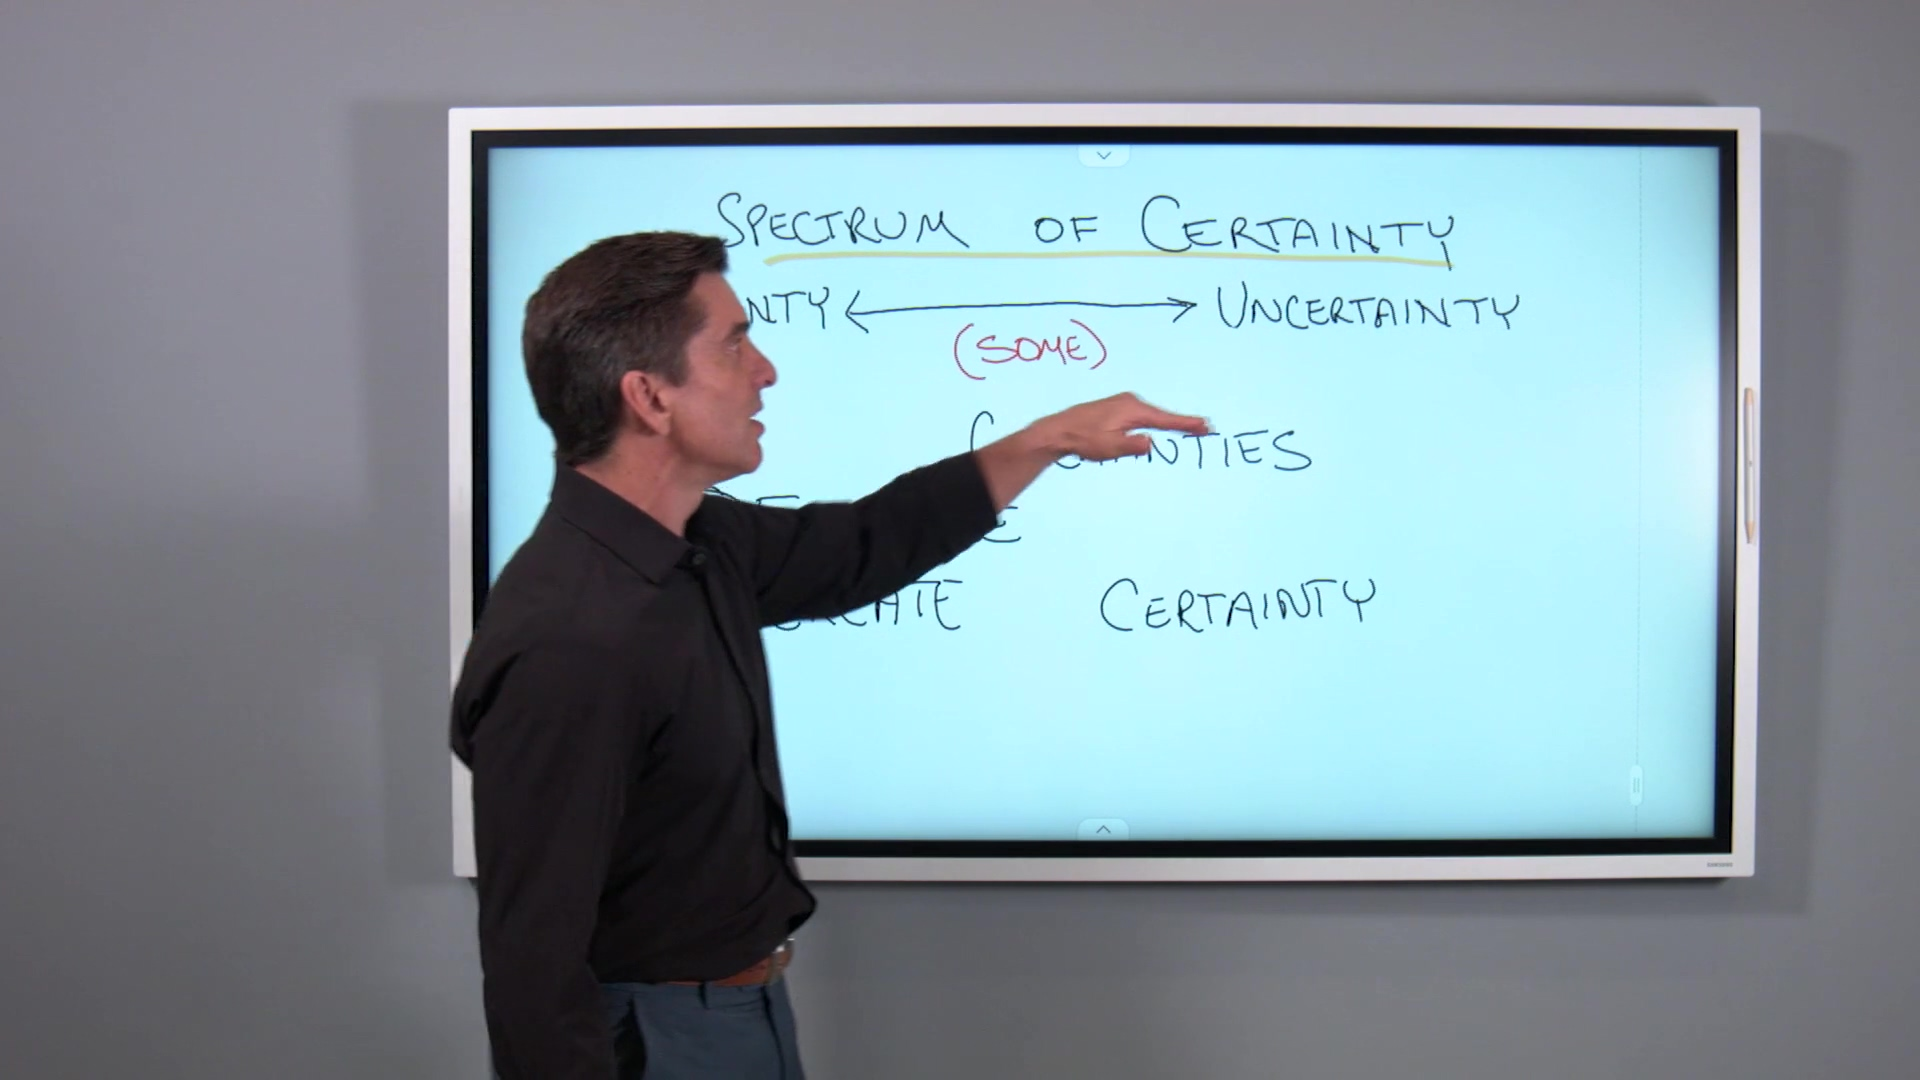 Spectrum of Certainty